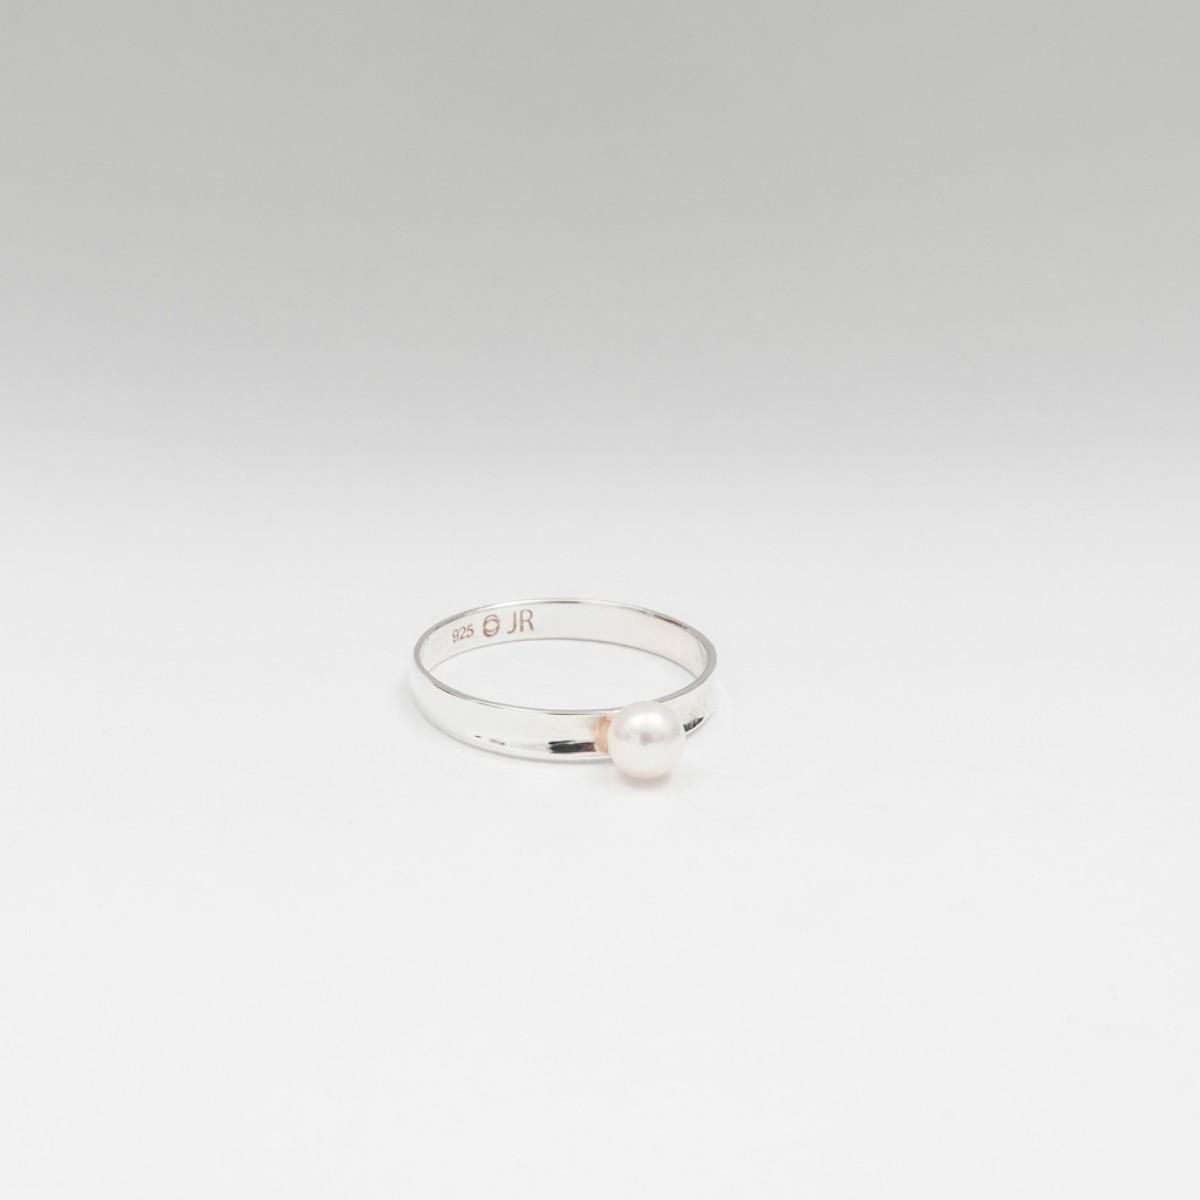 Jonathan Radetz Jewellery, Ring AKOYA, Gold 375, Japanische Akoya Perle